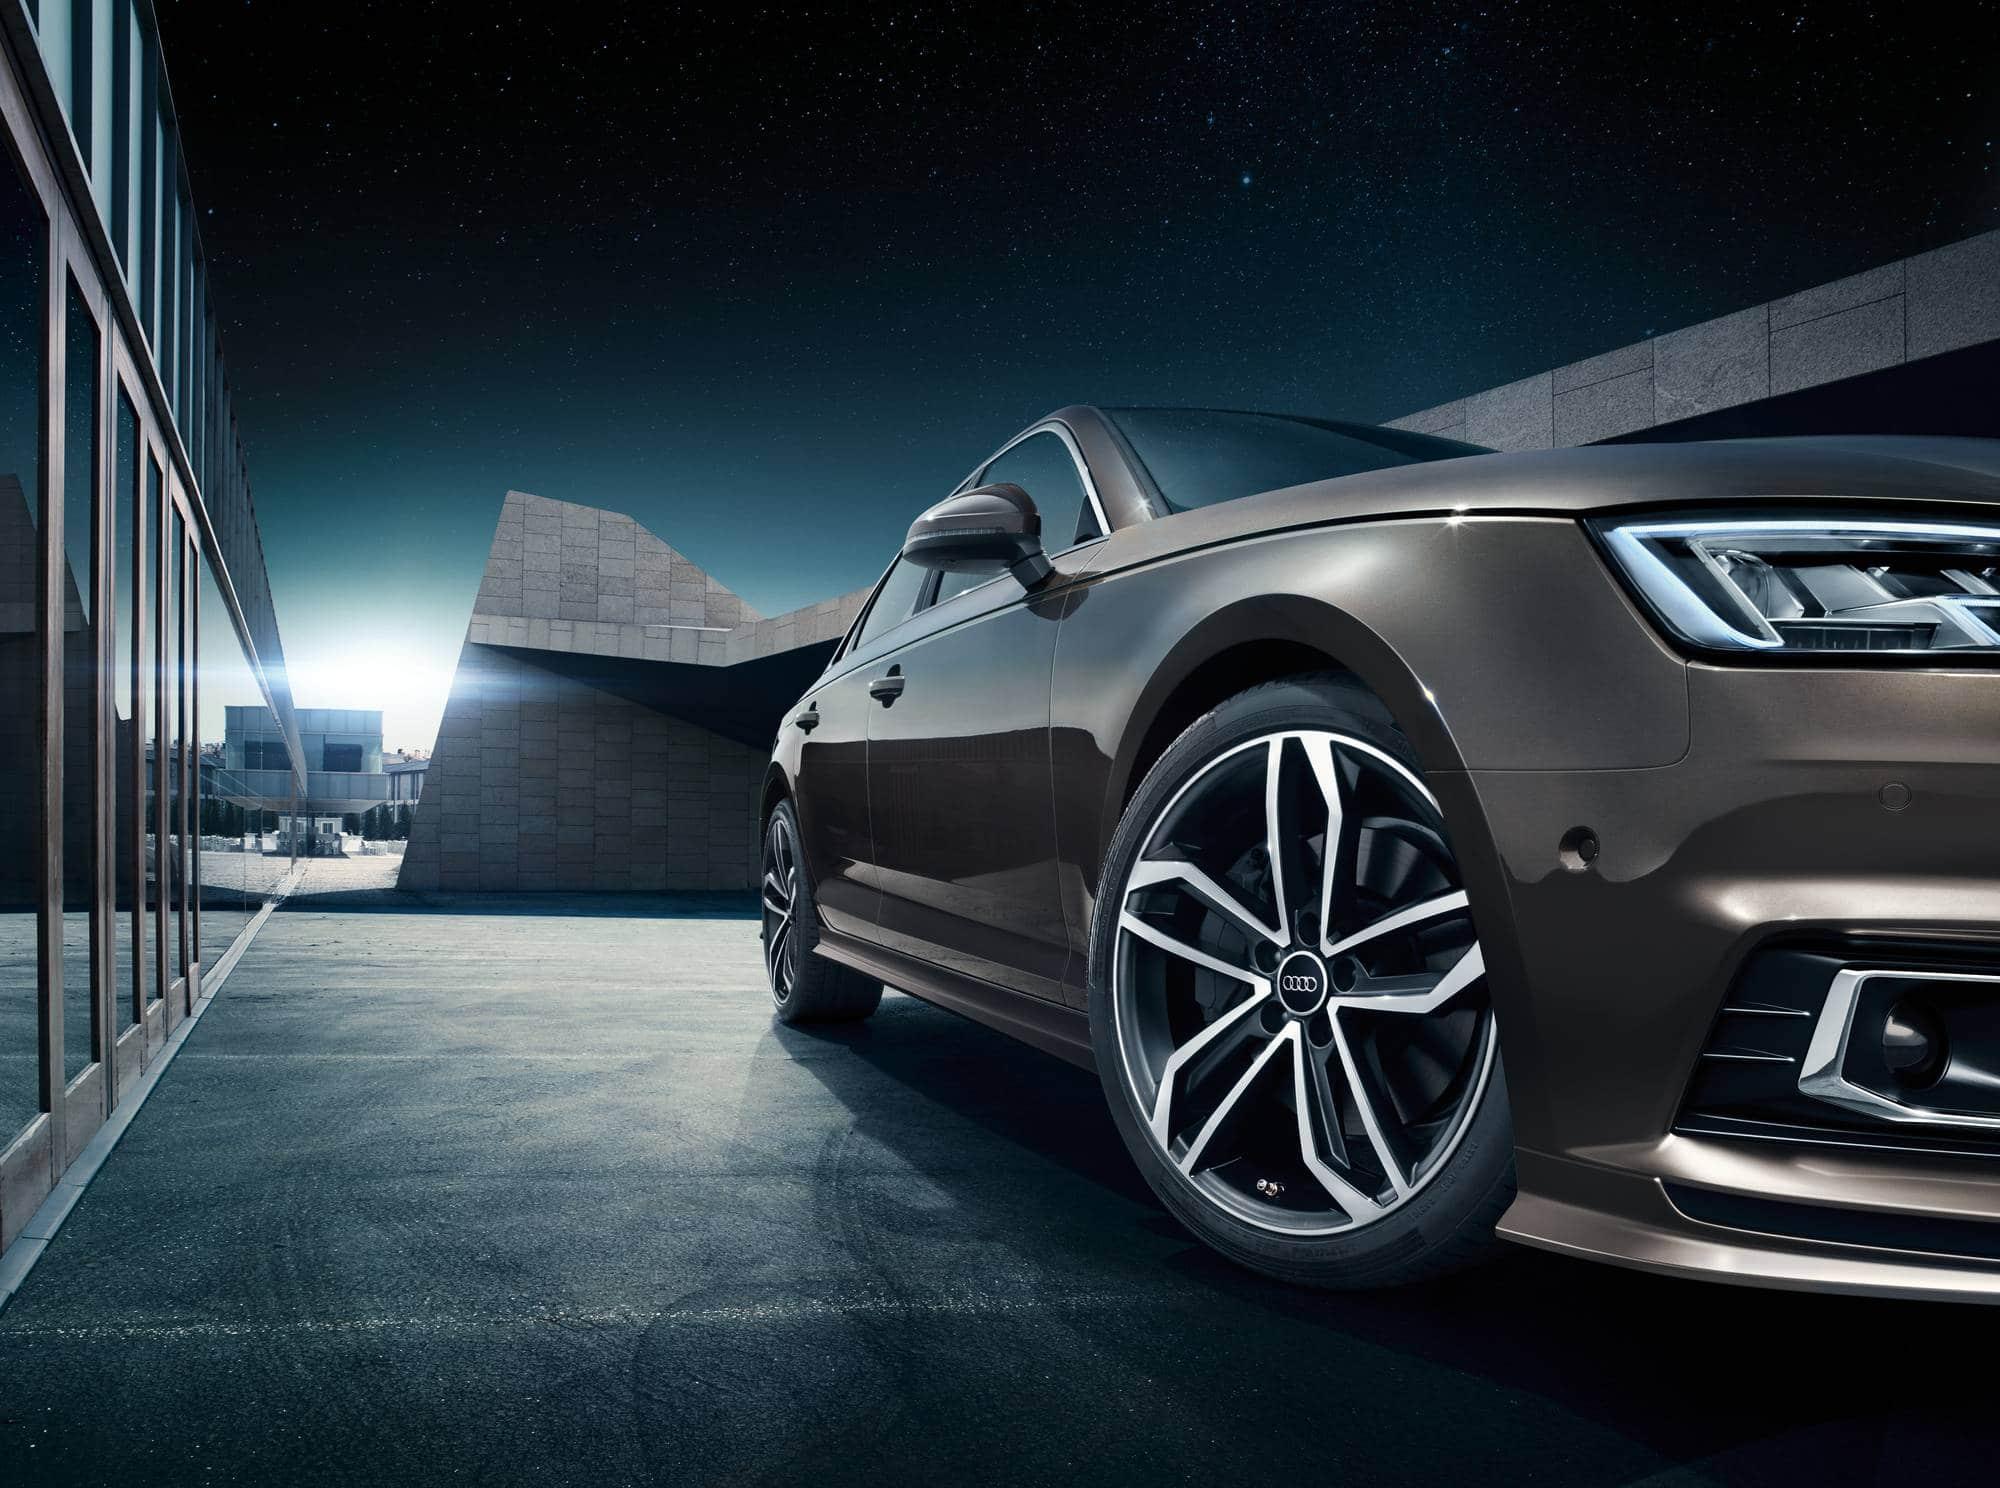 Win A Brandnew Audi A Equipped With Audi Genuine Accessories - Audi home